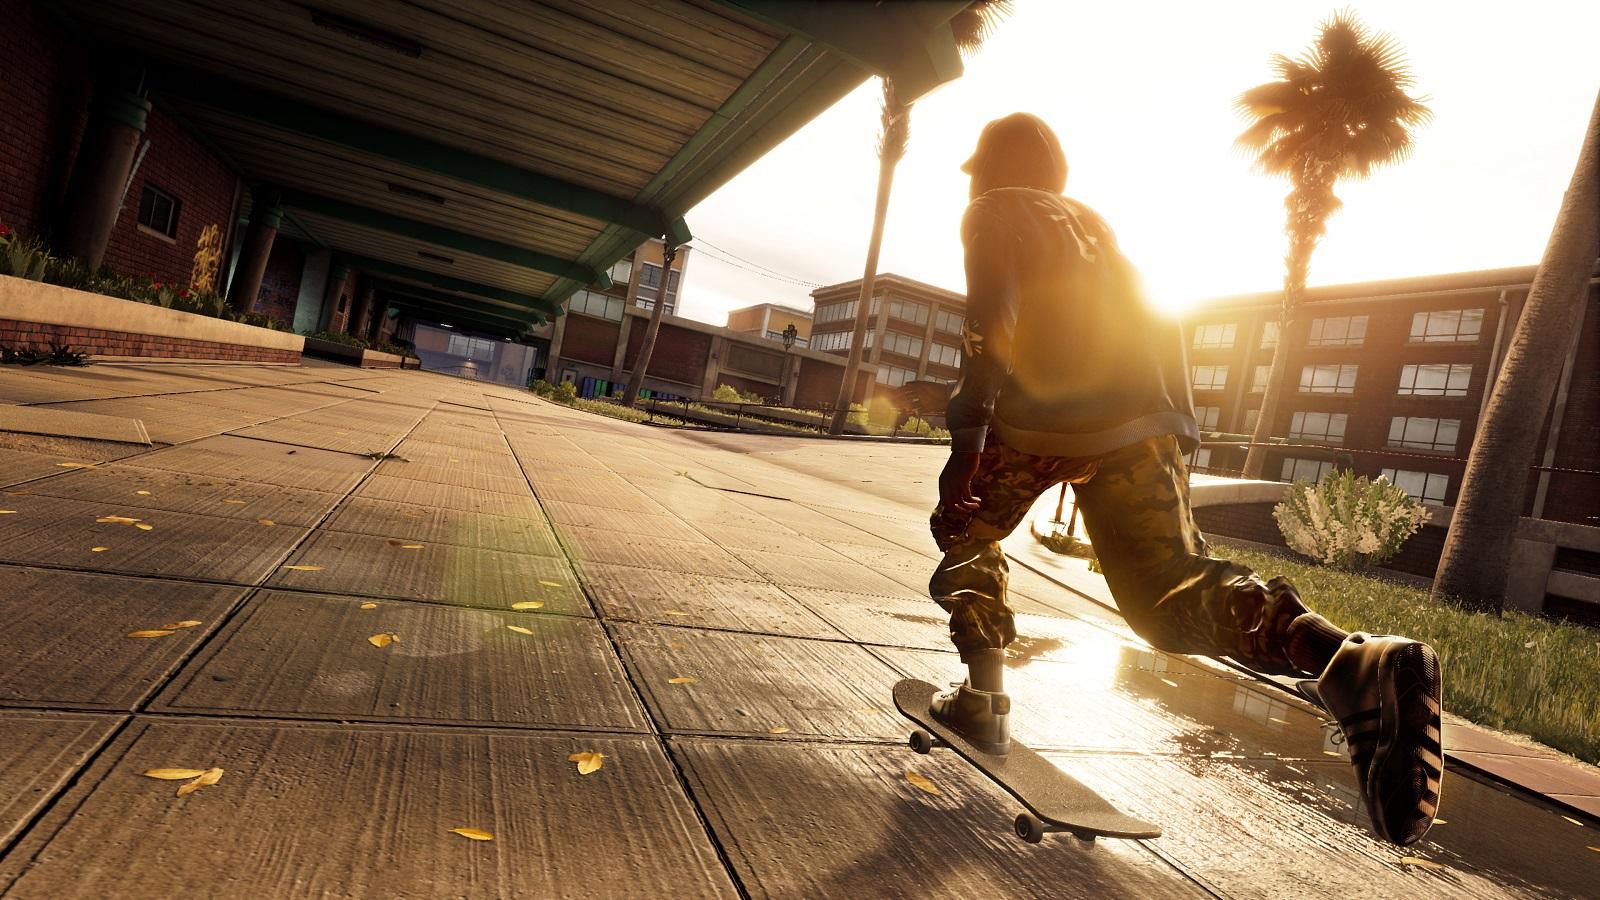 Тони Хоук и «Крэш Бандикут» намекнули на расширение списка целевых платформ Tony Hawk's Pro Skater 1 + 2